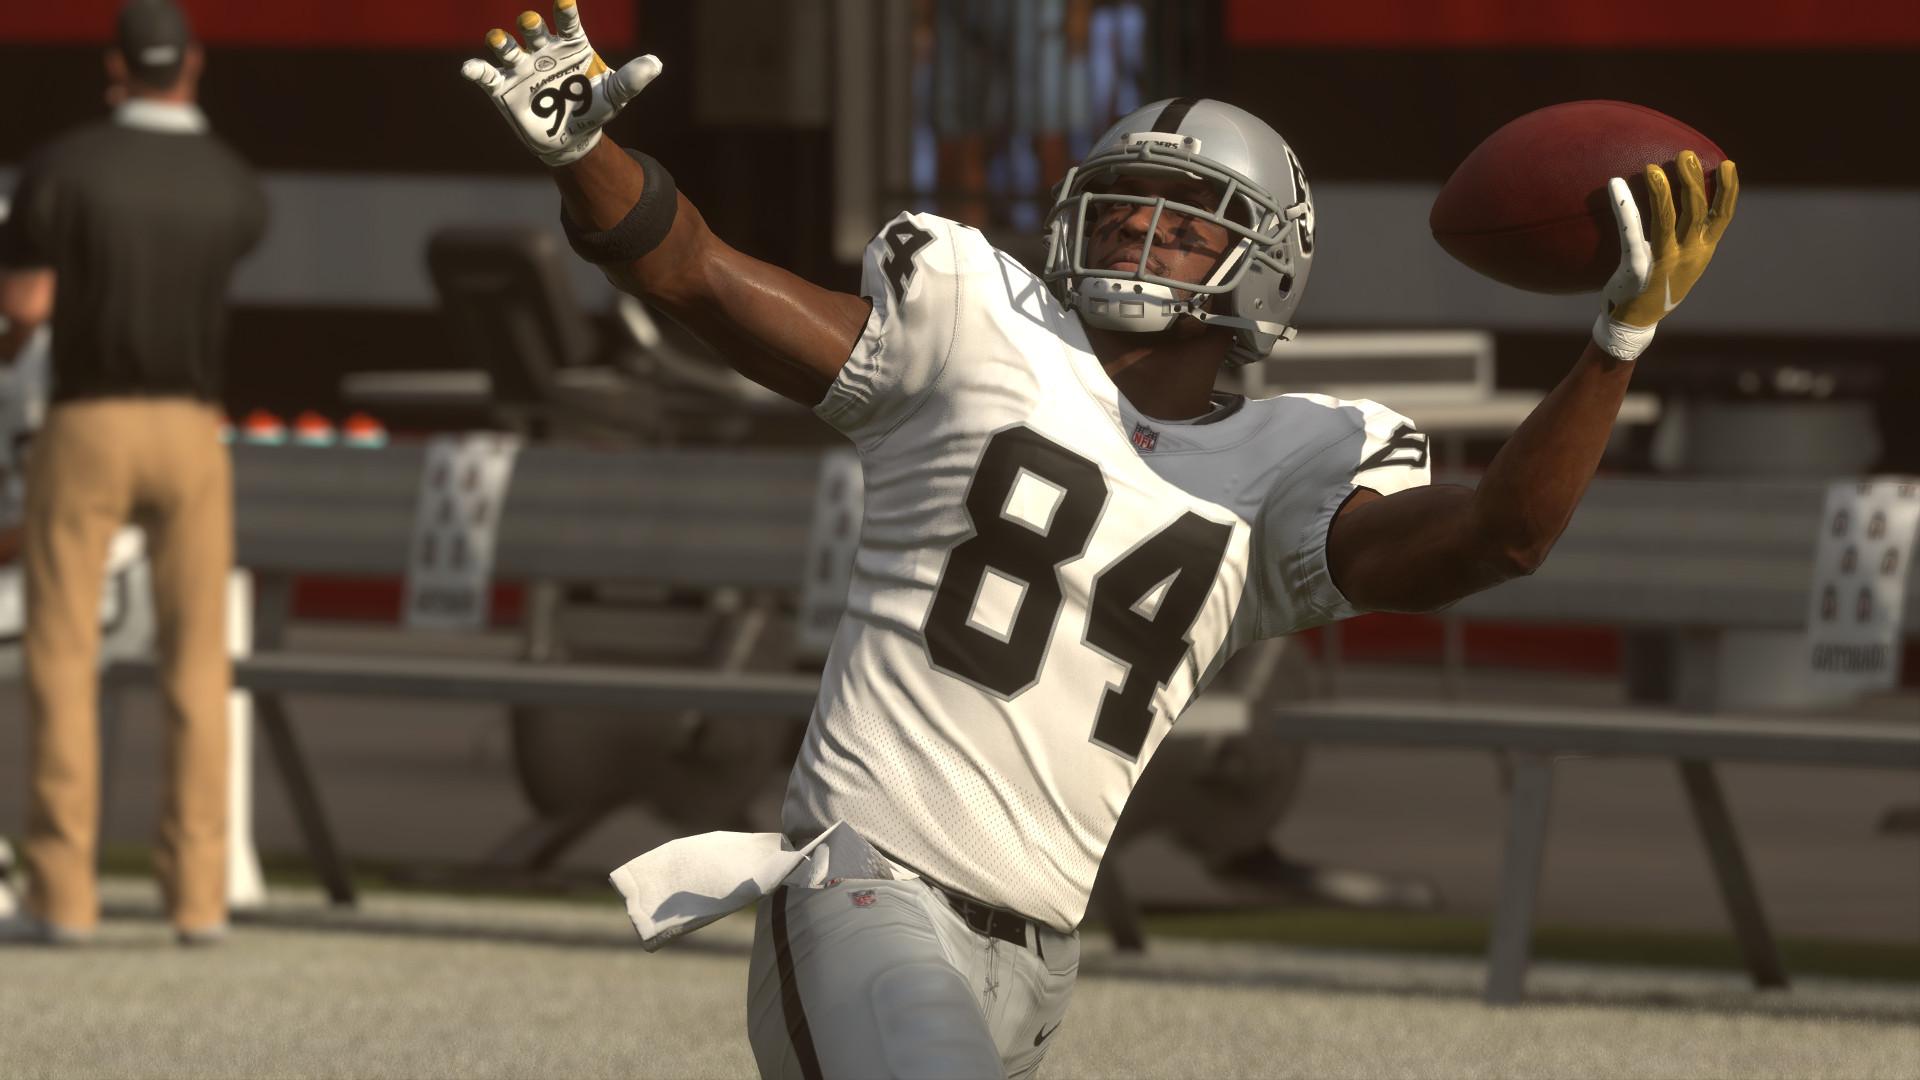 Madden NFL Antonio Brown Oakland Raiders